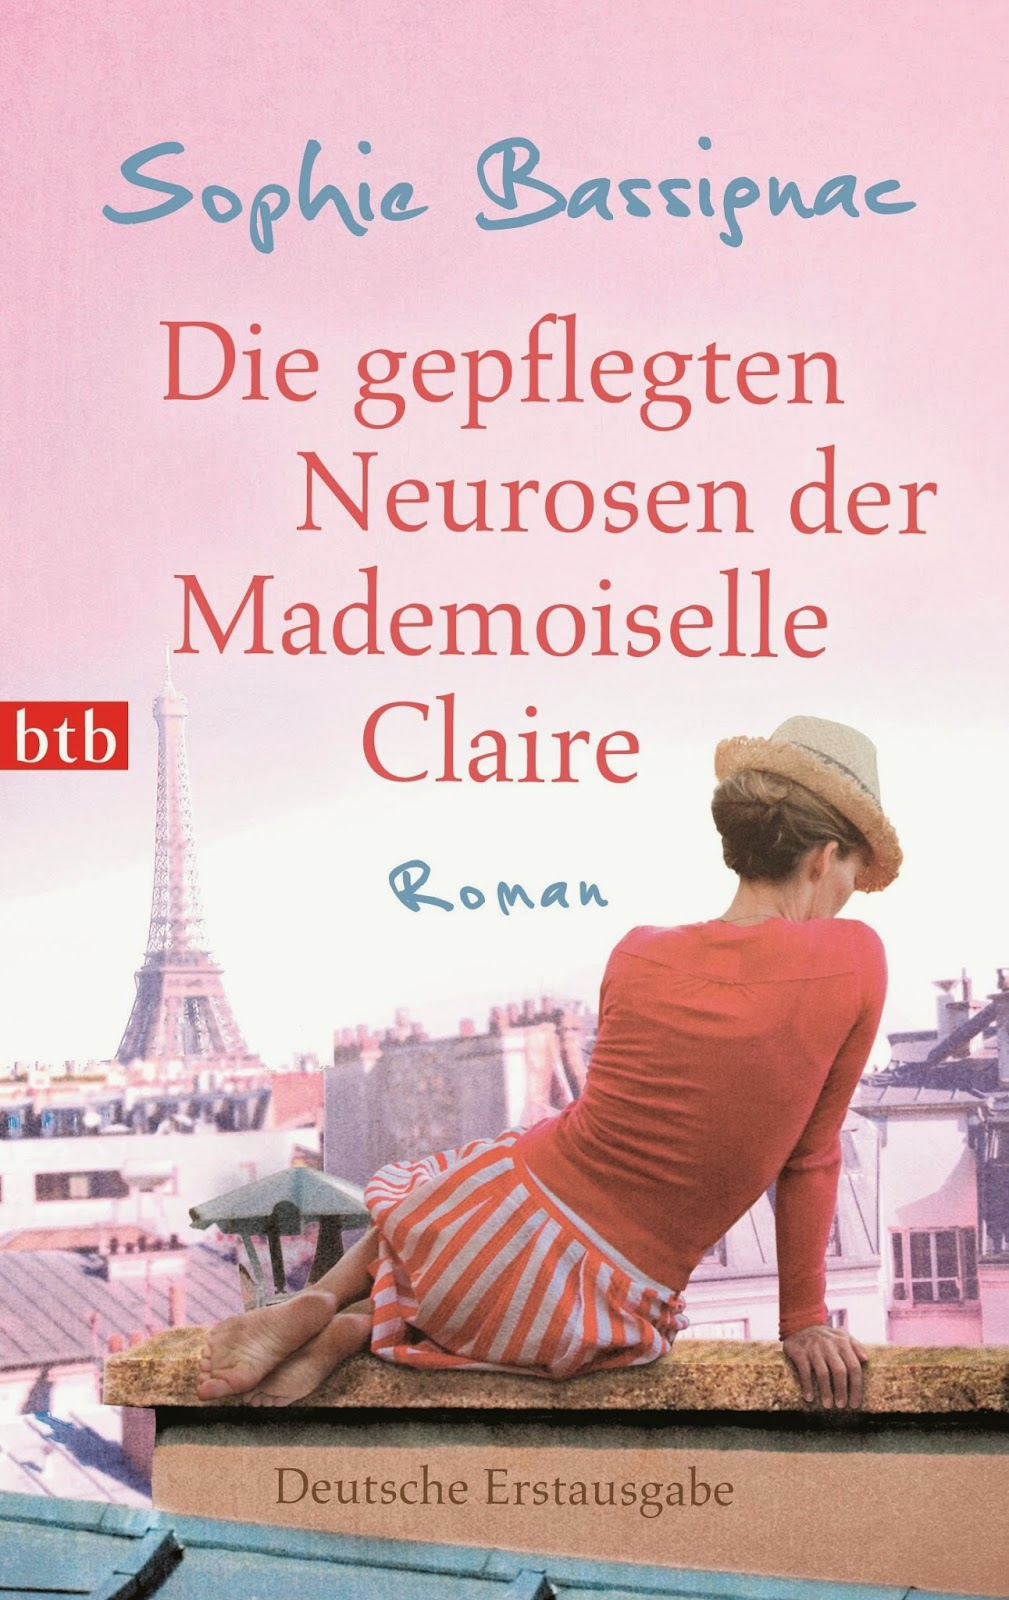 http://www.amazon.de/Die-gepflegten-Neurosen-Mademoiselle-Claire/dp/3442742099/ref=pd_sim_sbs_b_1?ie=UTF8&refRID=1FR6ZPW1XX5N2EMDW920